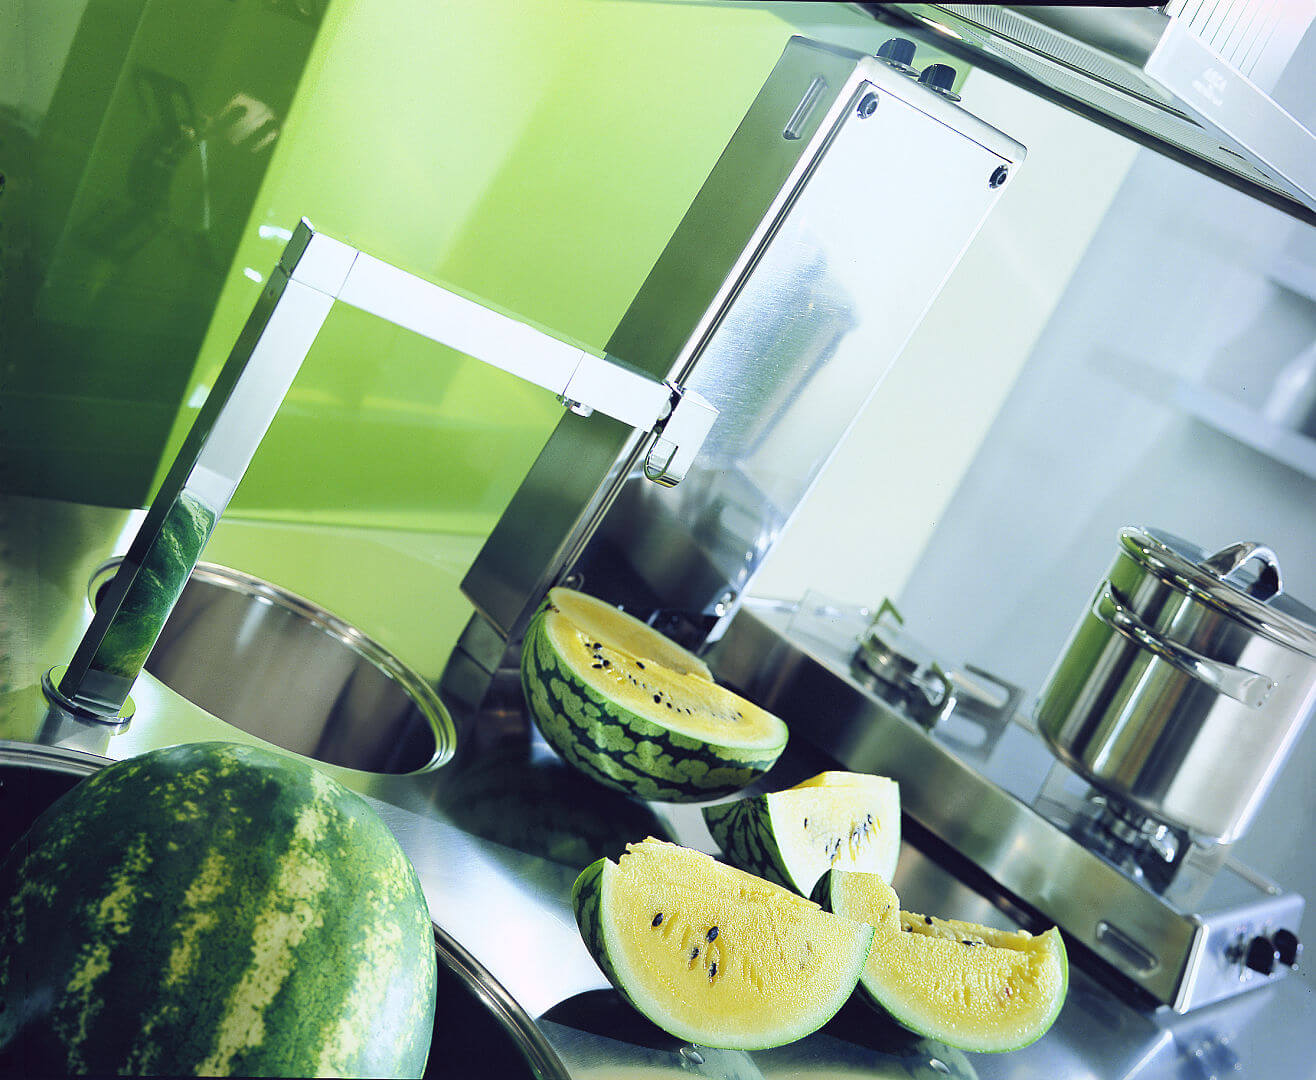 Arca Cucine Italia - Cucina in Acciaio Inox su misura - Lavello